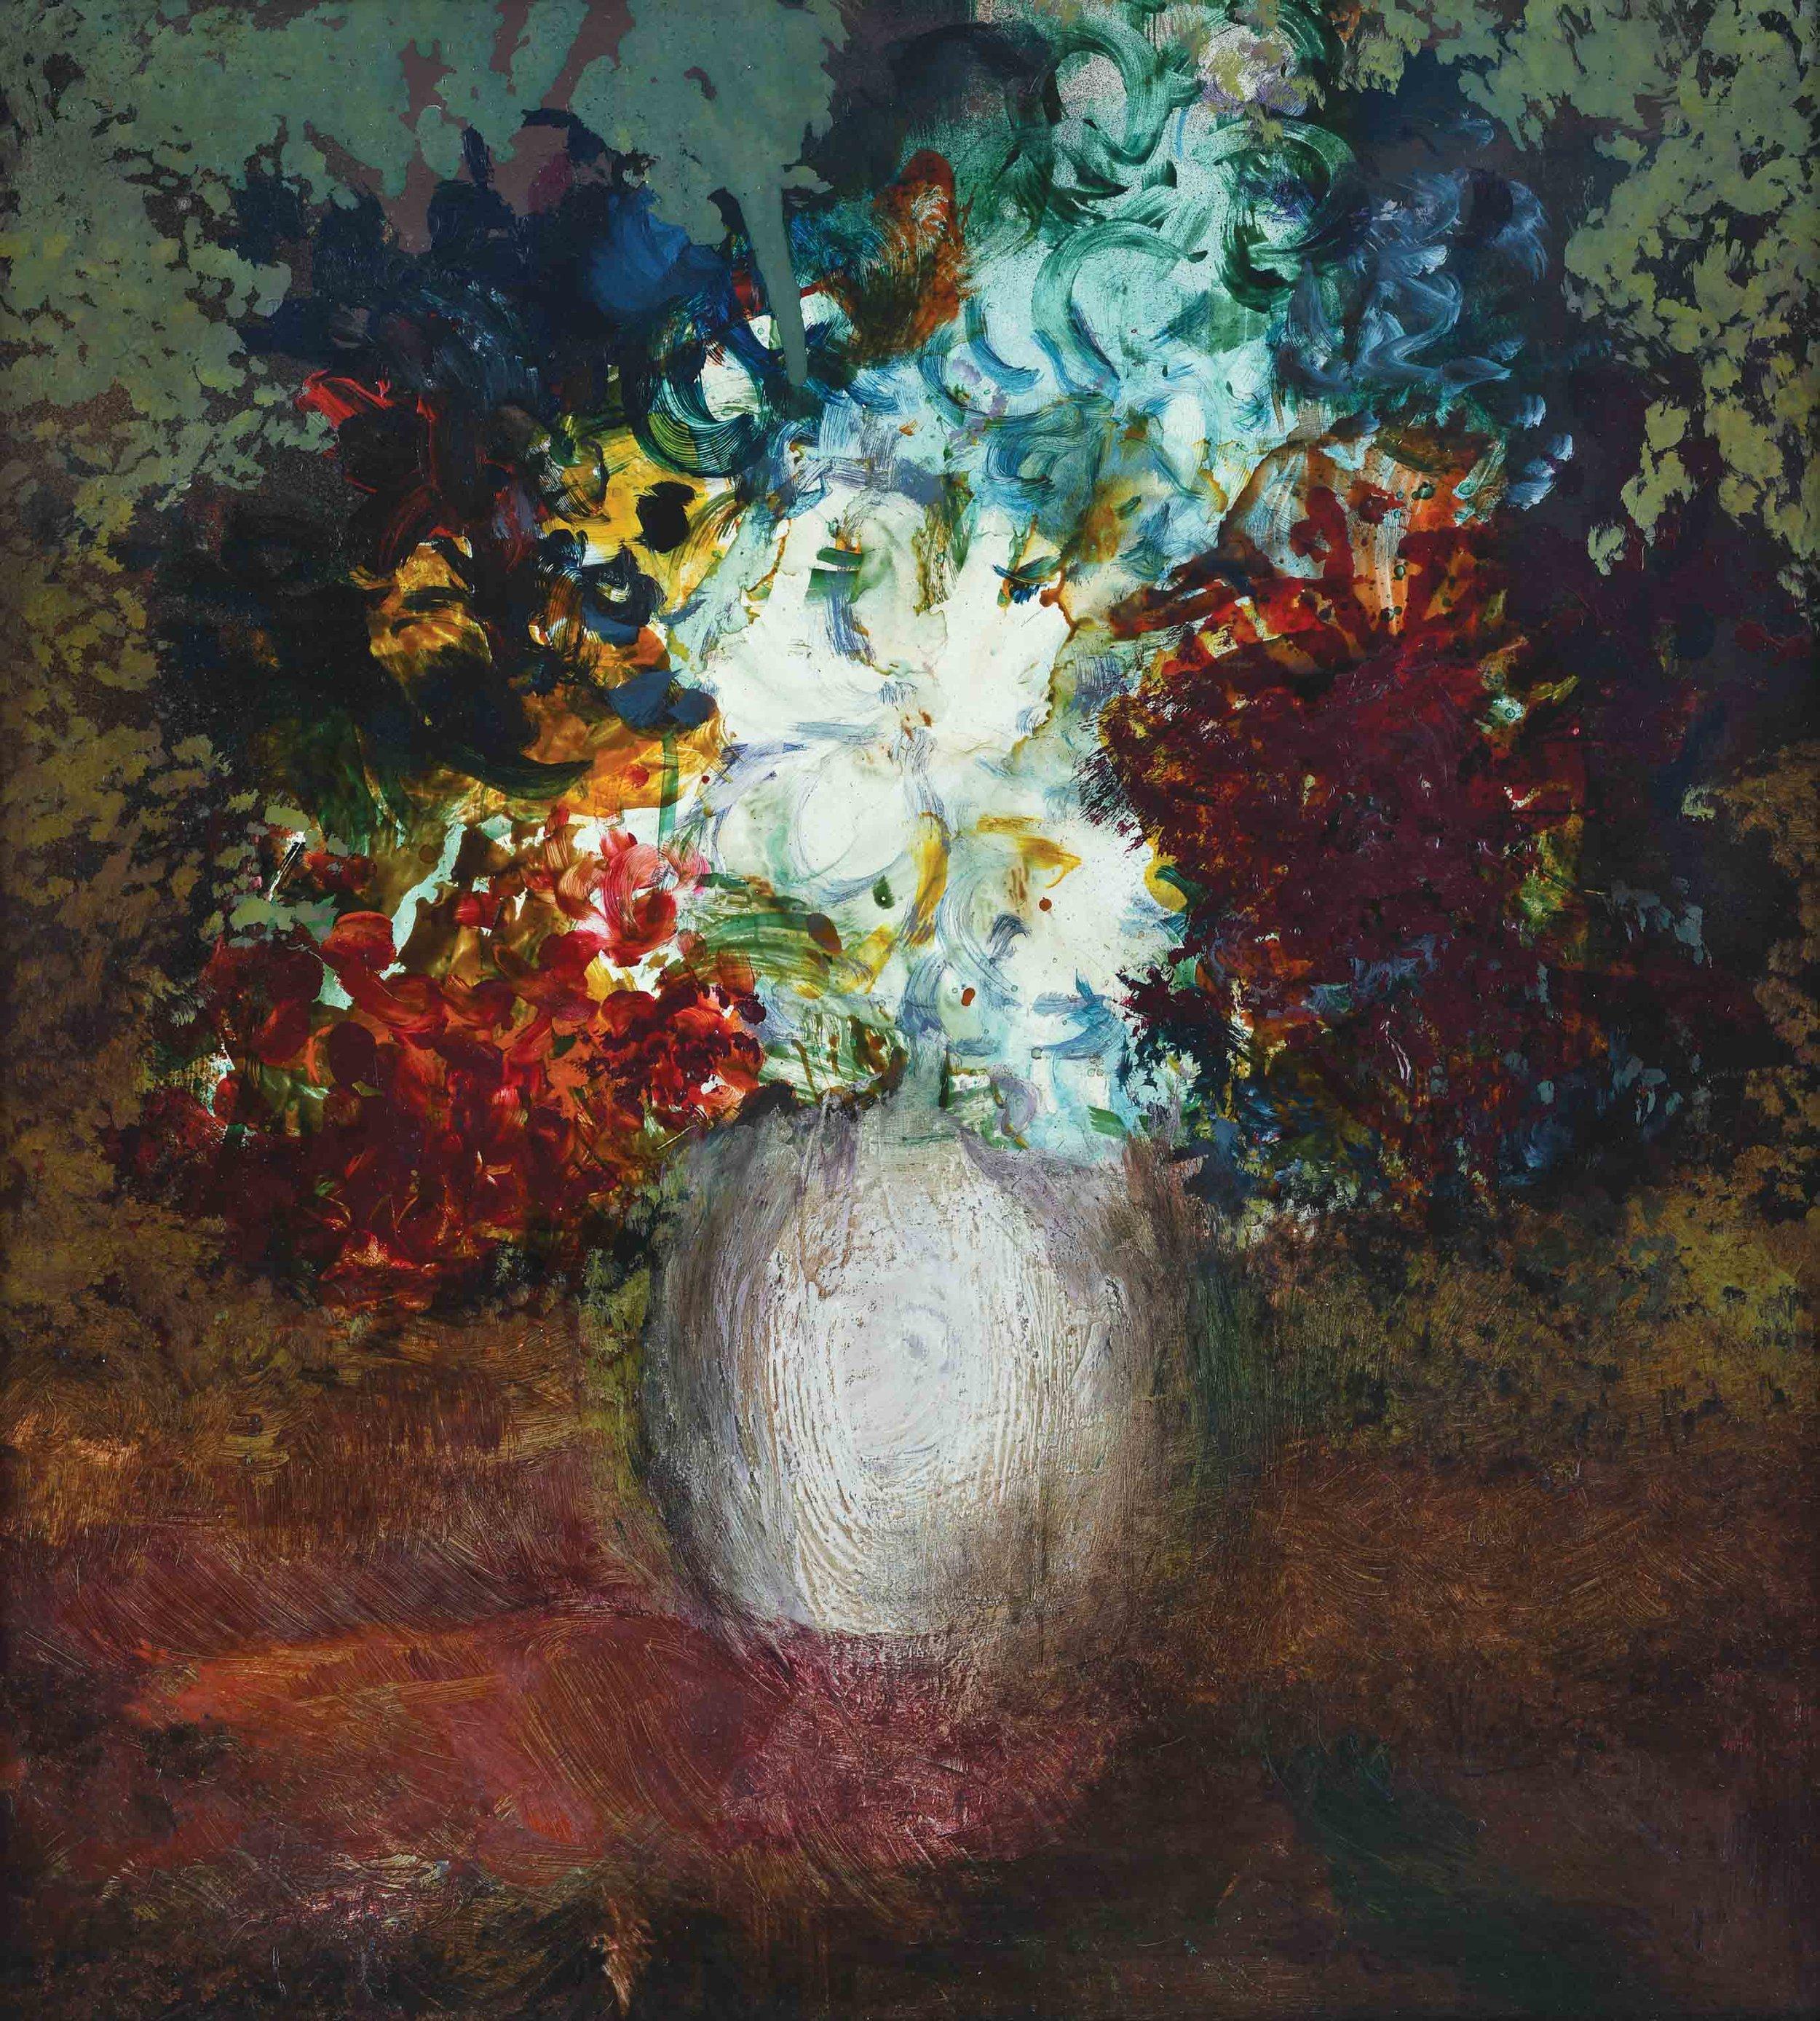 Vincent Hoisington, 'Untitled (Still Life)', 1970, oil on board, 55 x 50cm. Image courtesy of Art Agenda, S.E.A.